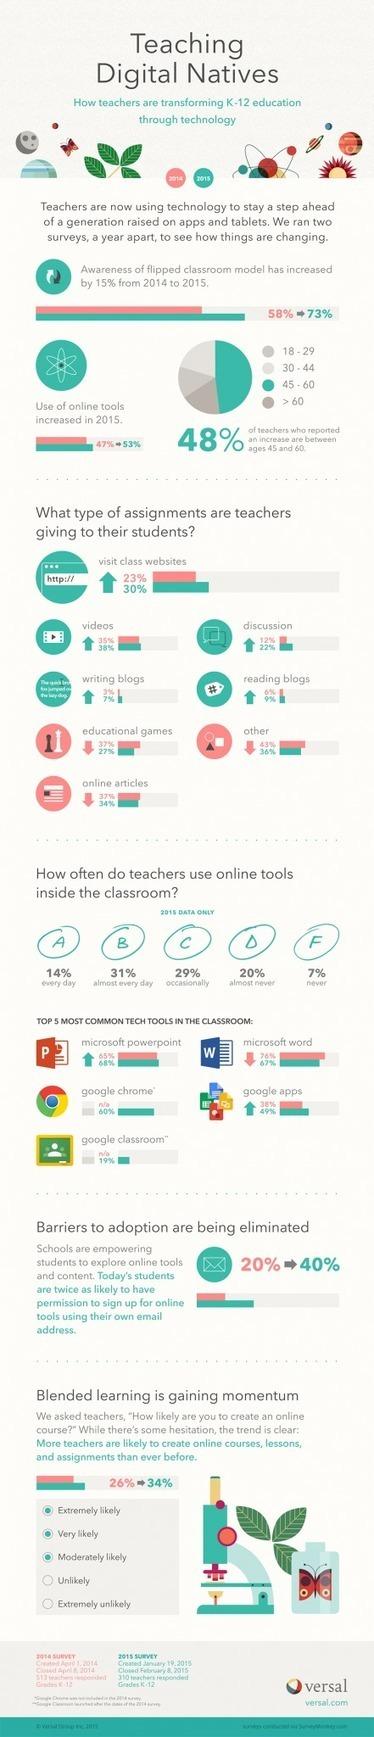 Teaching Digital Natives Infographic | ICT Integration in Australian Schools | Scoop.it